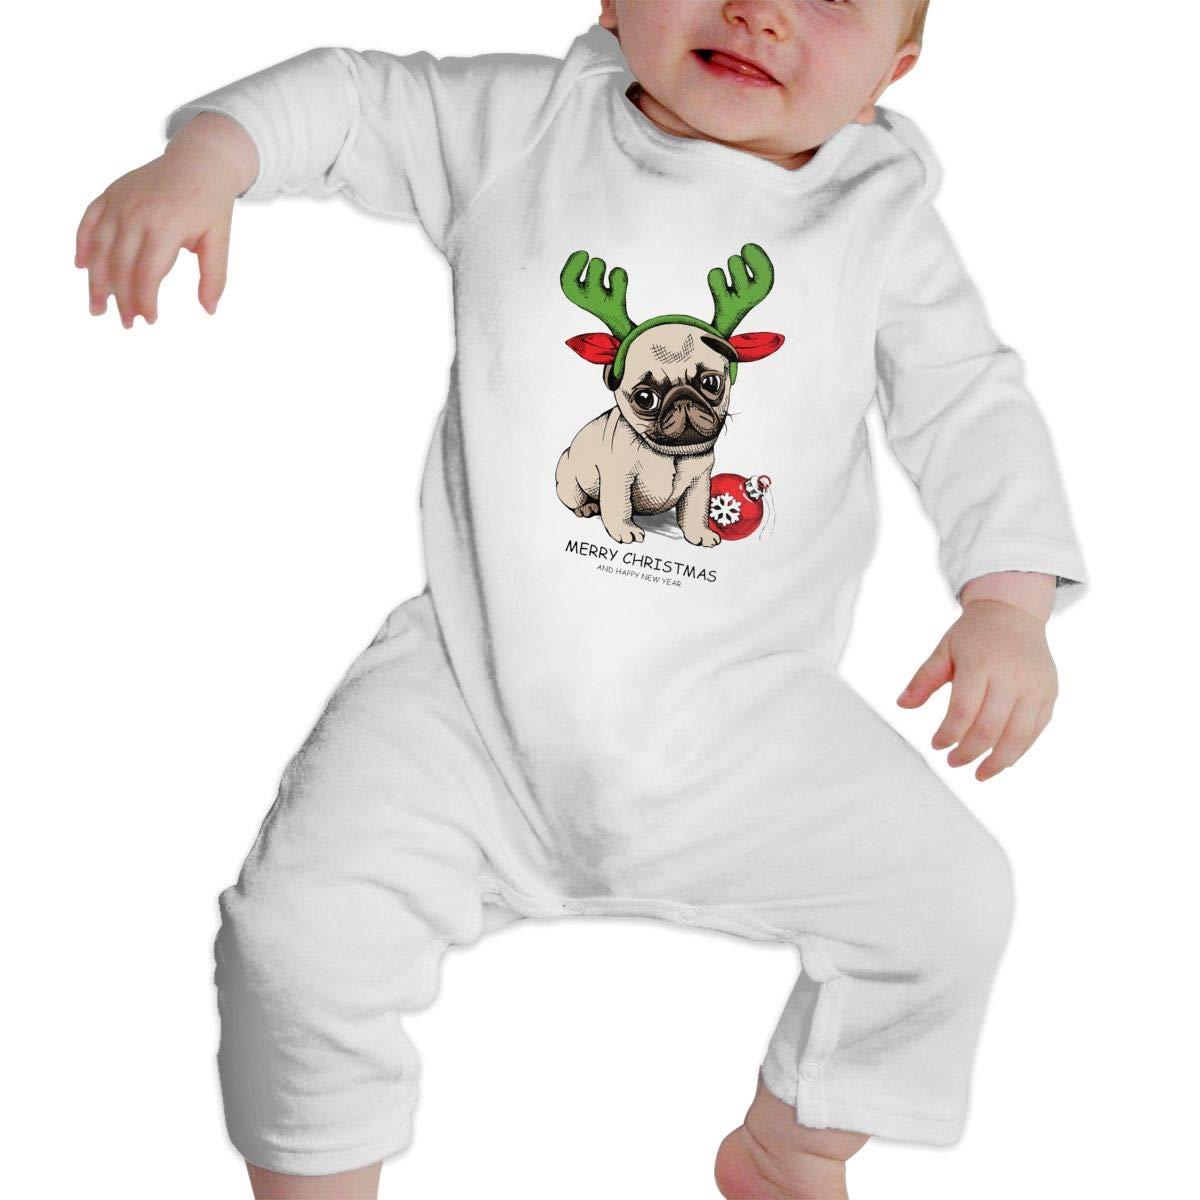 NOALKJ Babys Long Sleeve Romper,Merry-Christmas-Dog Jumpsuit Bodysuit Clothes